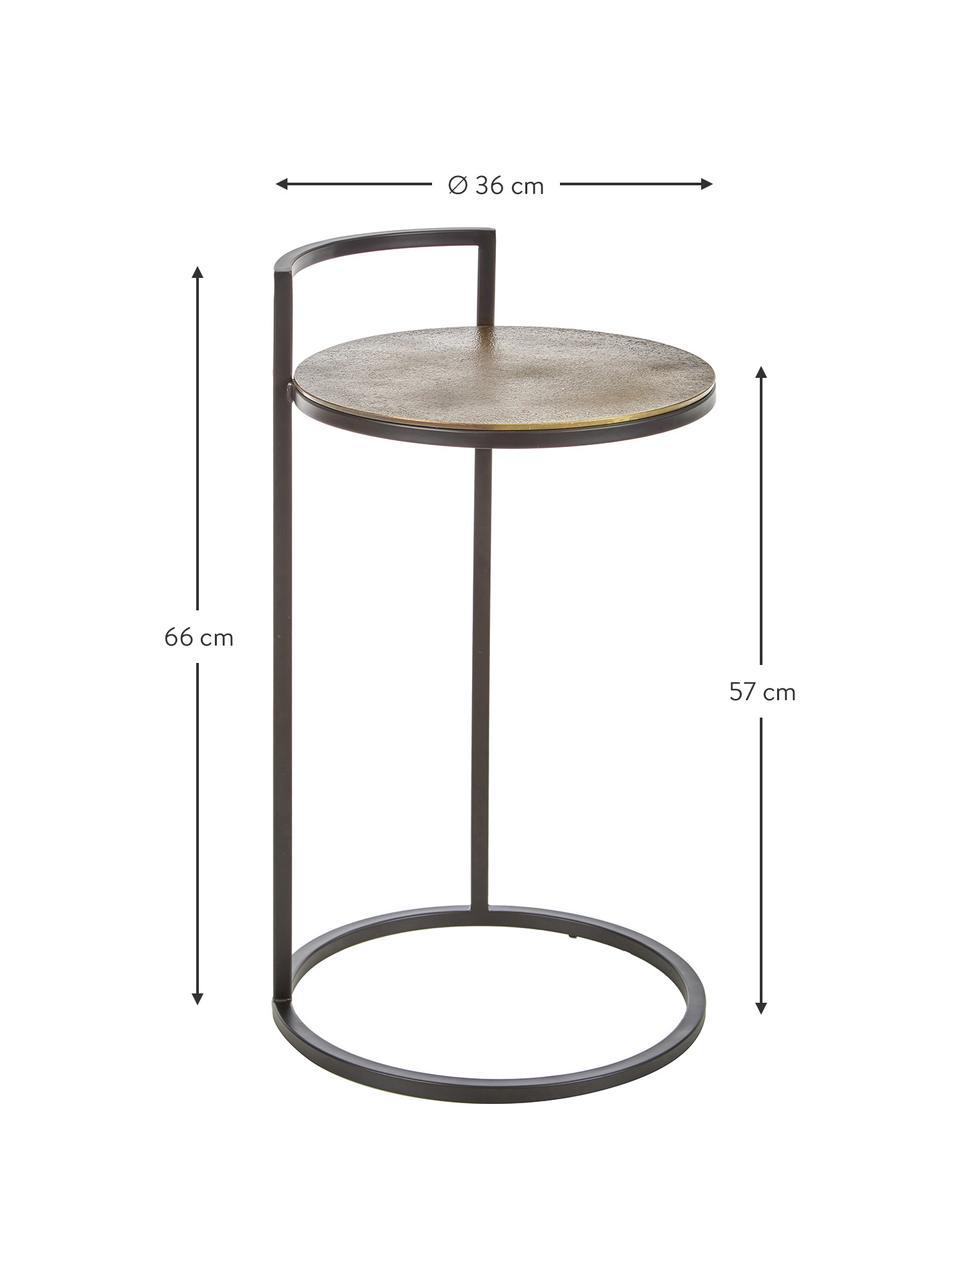 Runder Beistelltisch Circle aus Metall, Tischplatte: Metall, beschichtet, Gestell: Metall, pulverbeschichtet, Gold, Schwarz, Ø 36 x H 66 cm